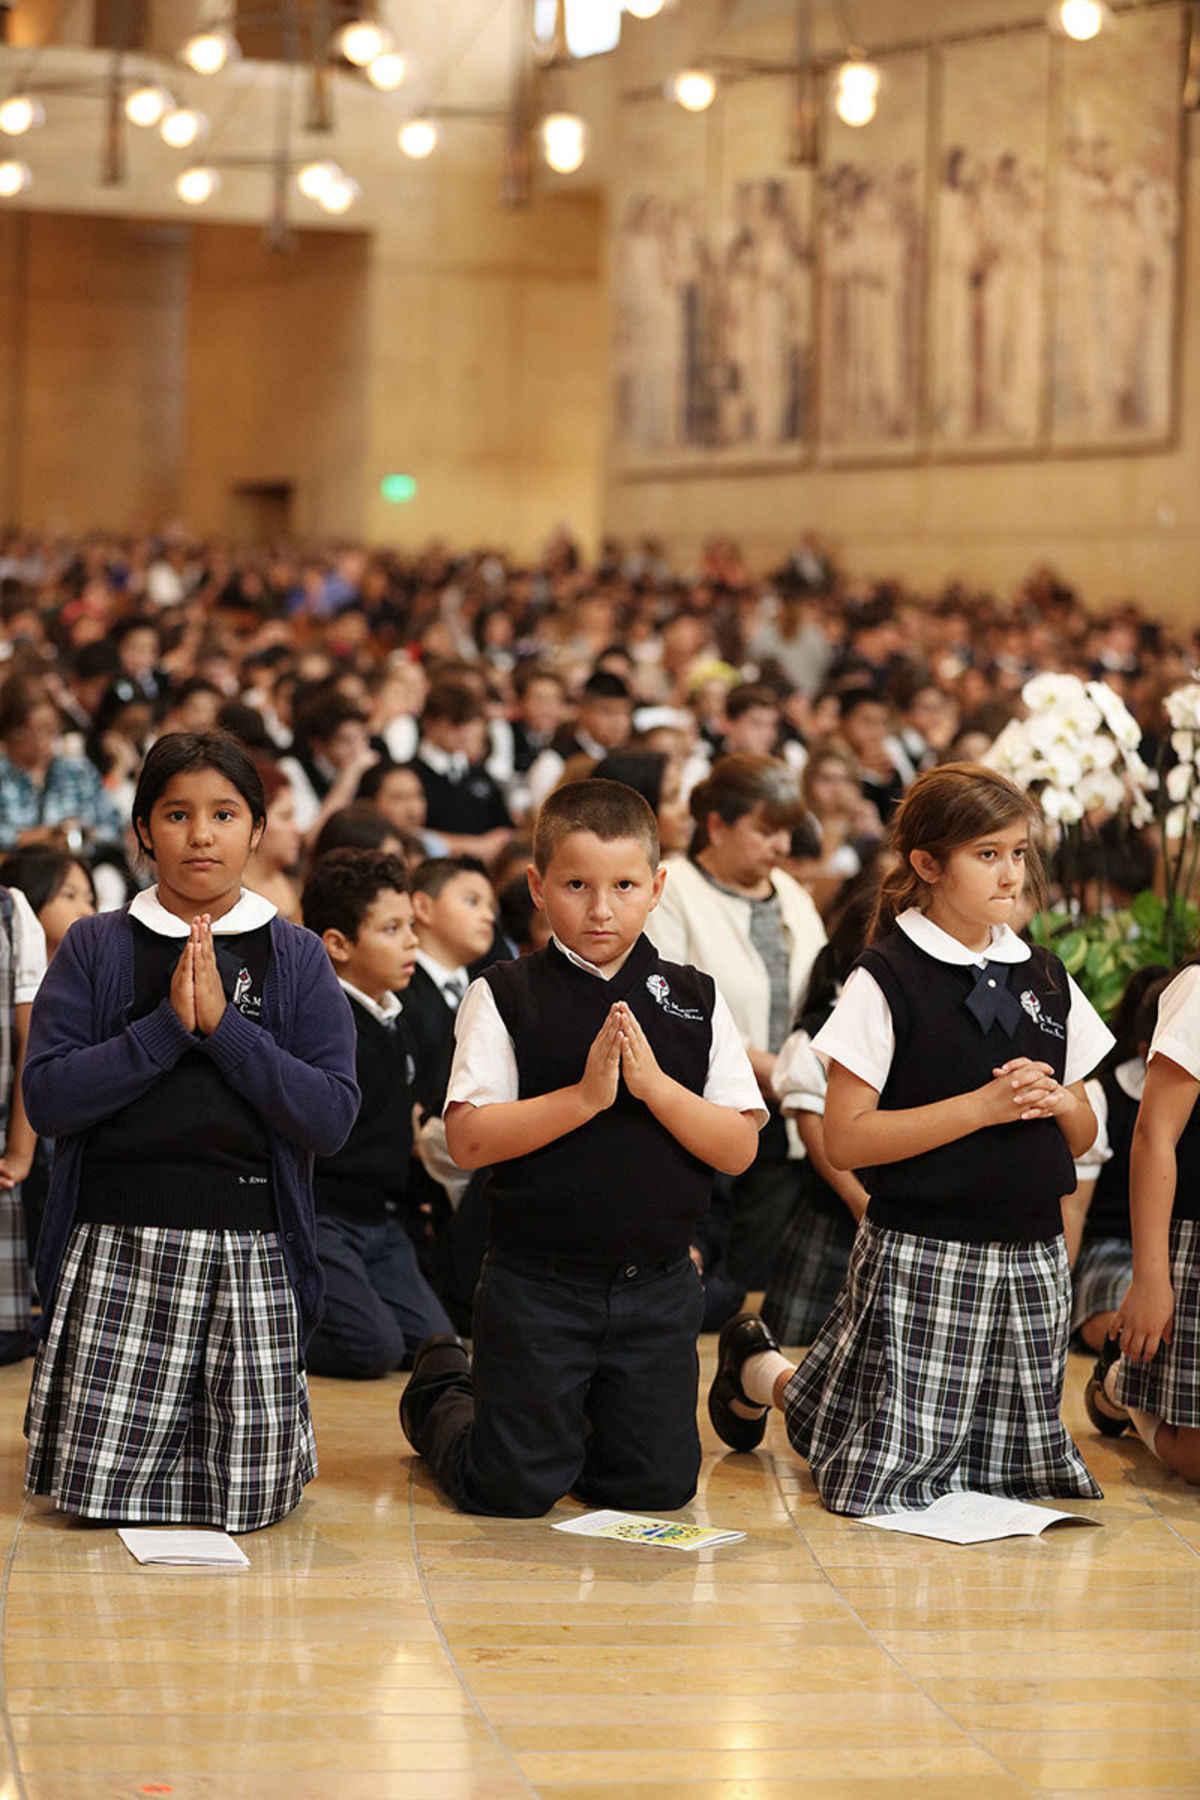 A 'hopeful and optimistic' outlook on Catholic schools